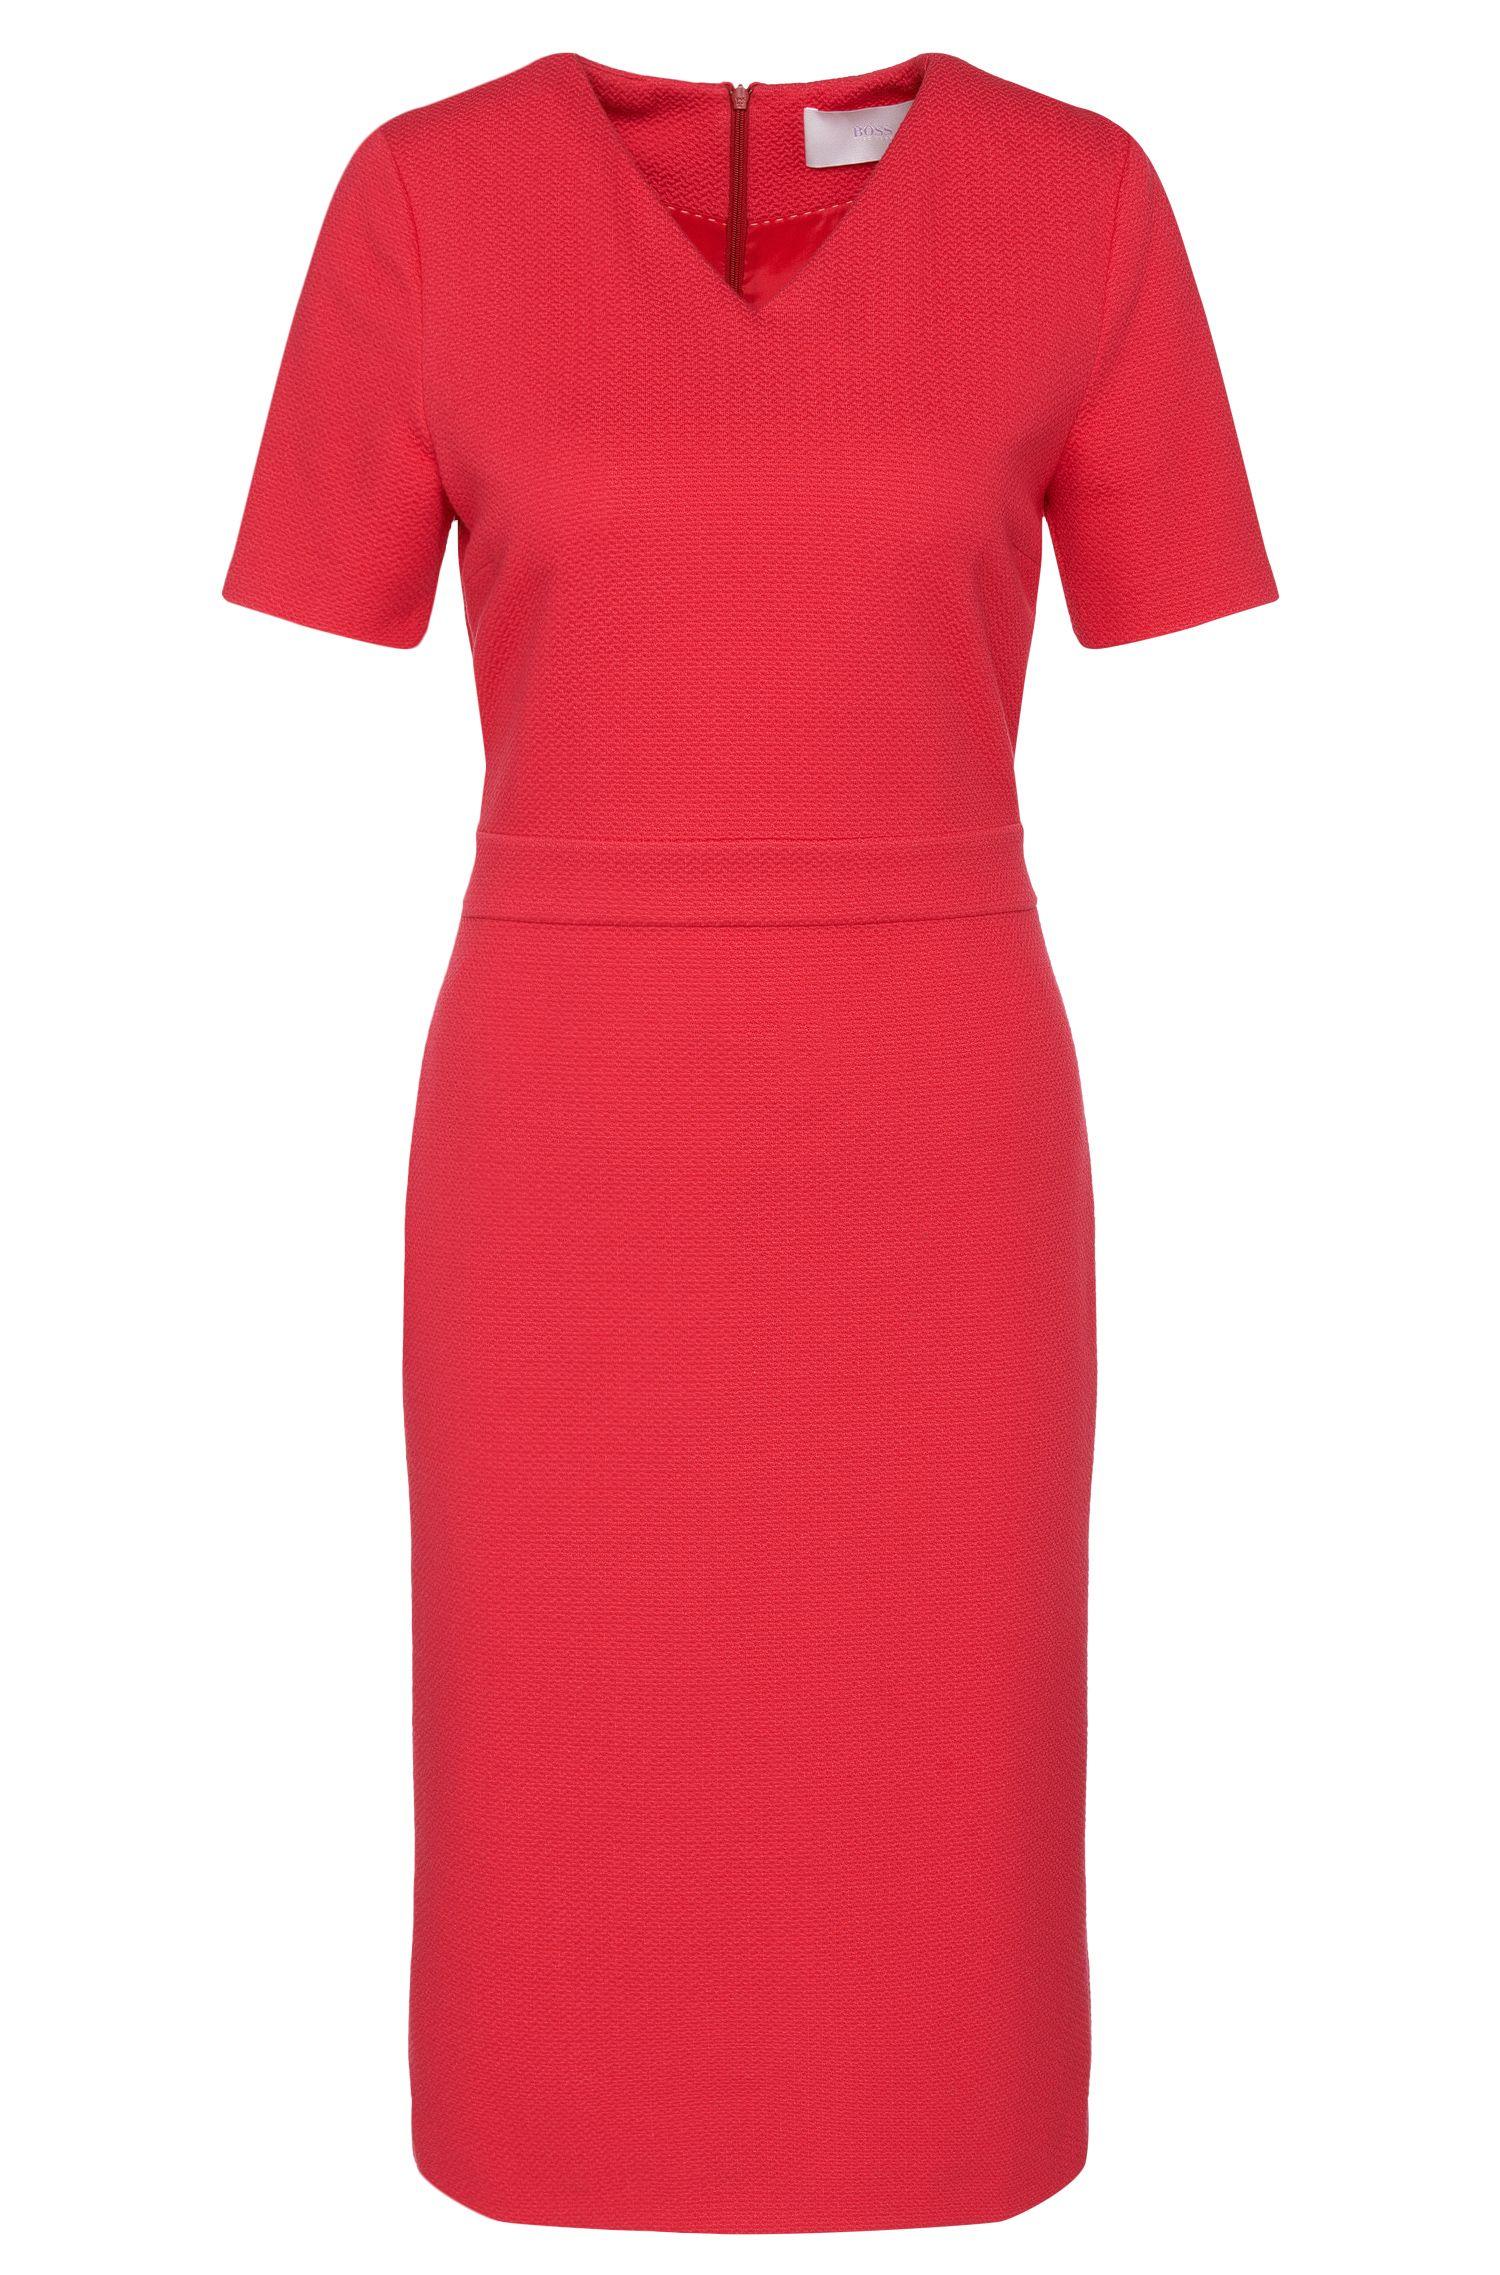 'Helala' | Stretch Viscose Textured Sheath Dress